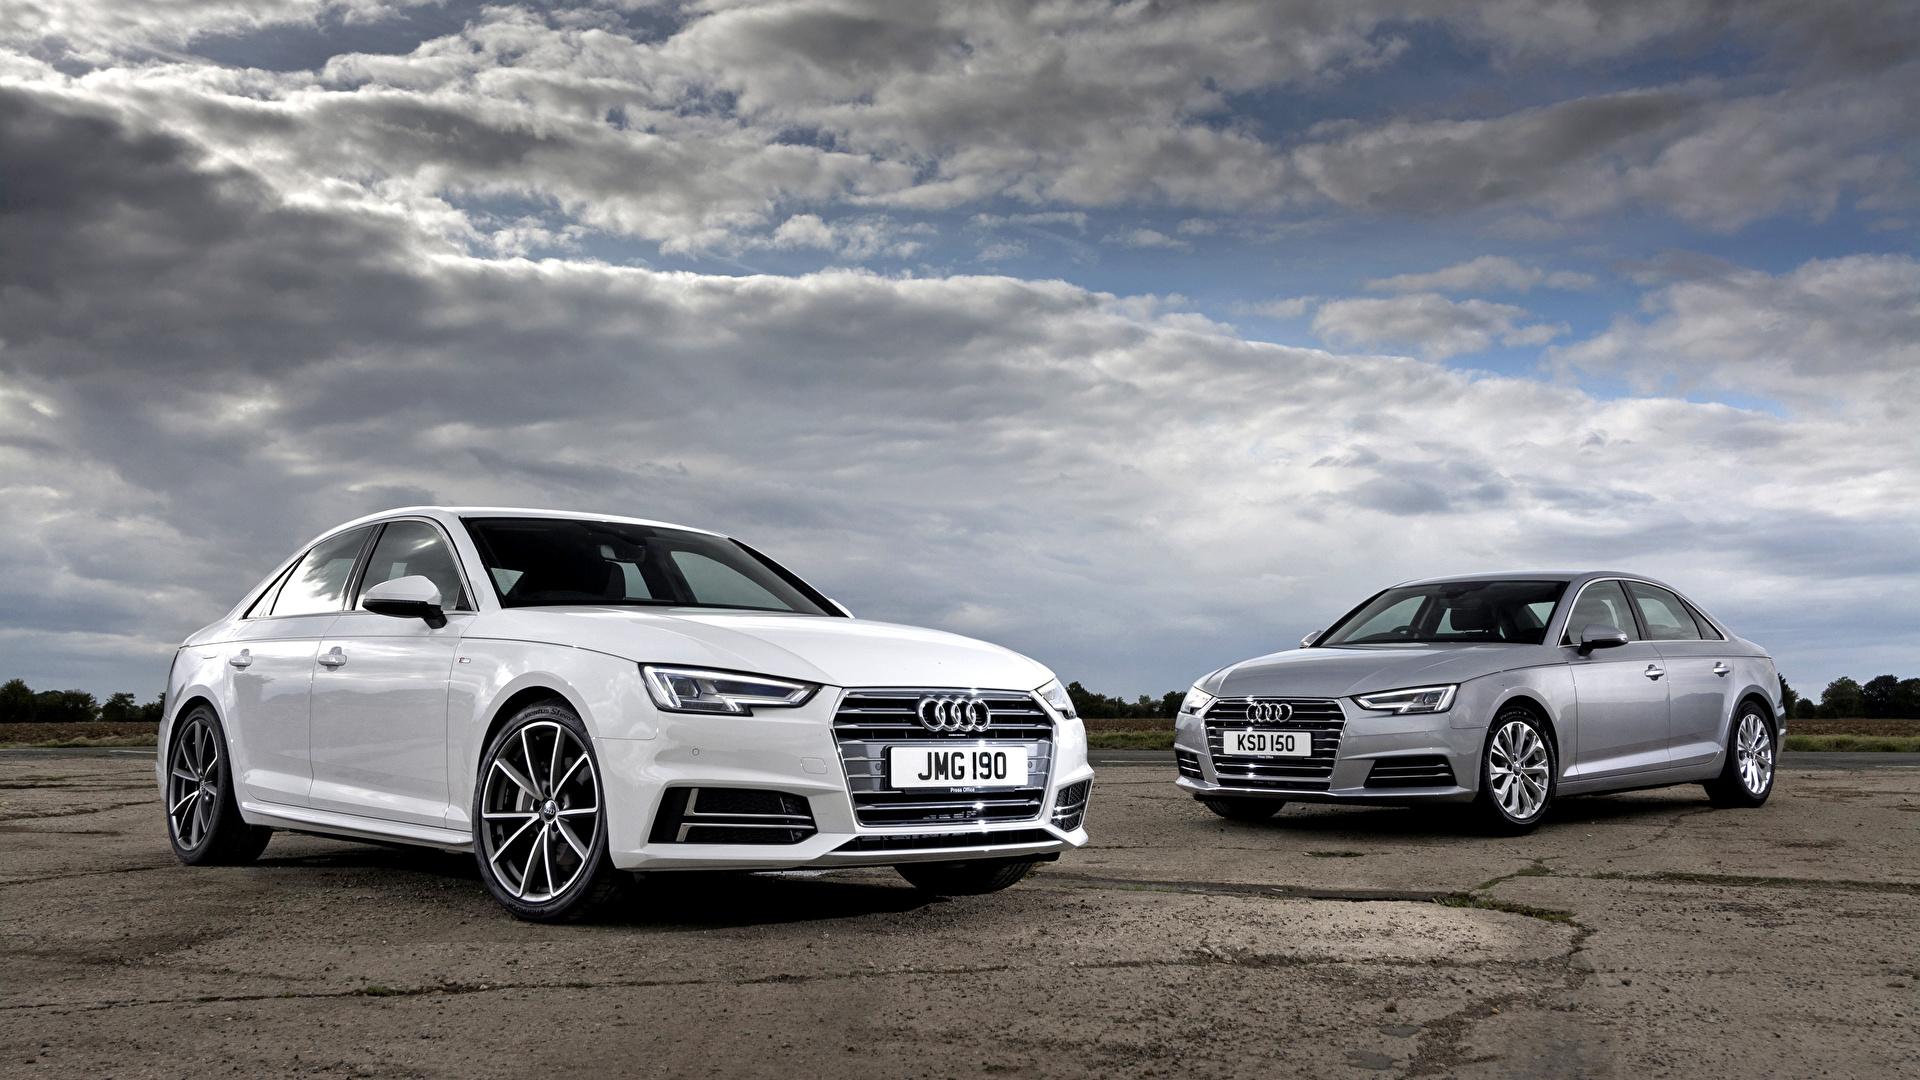 Sfondi Audi 2015 Berlina Due 2 autovettura 1920x1080 Auto macchina macchine automobile